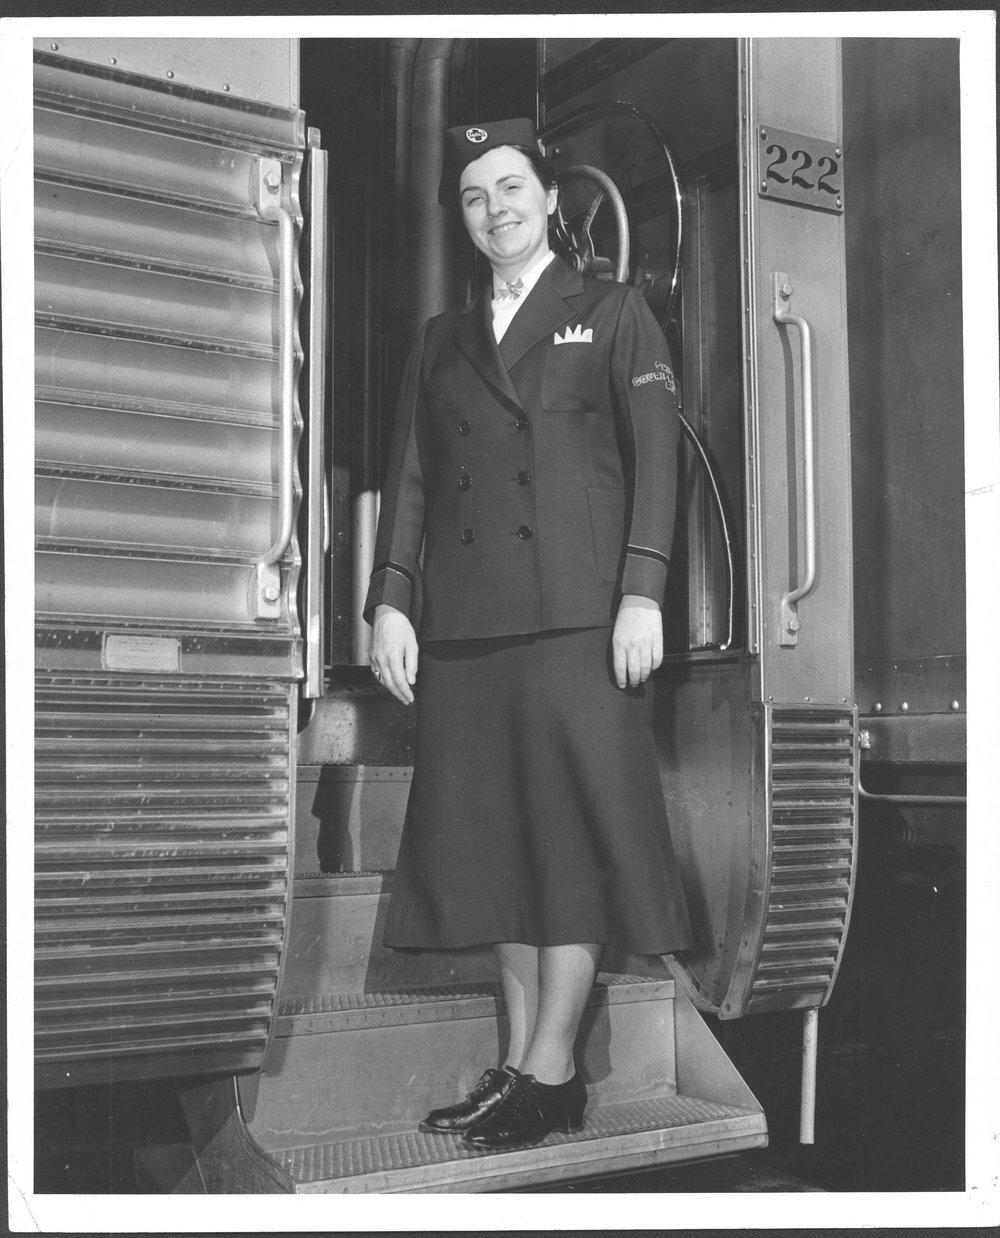 Delma Frasser, Atchison, Topeka & Santa Fe courier nurse